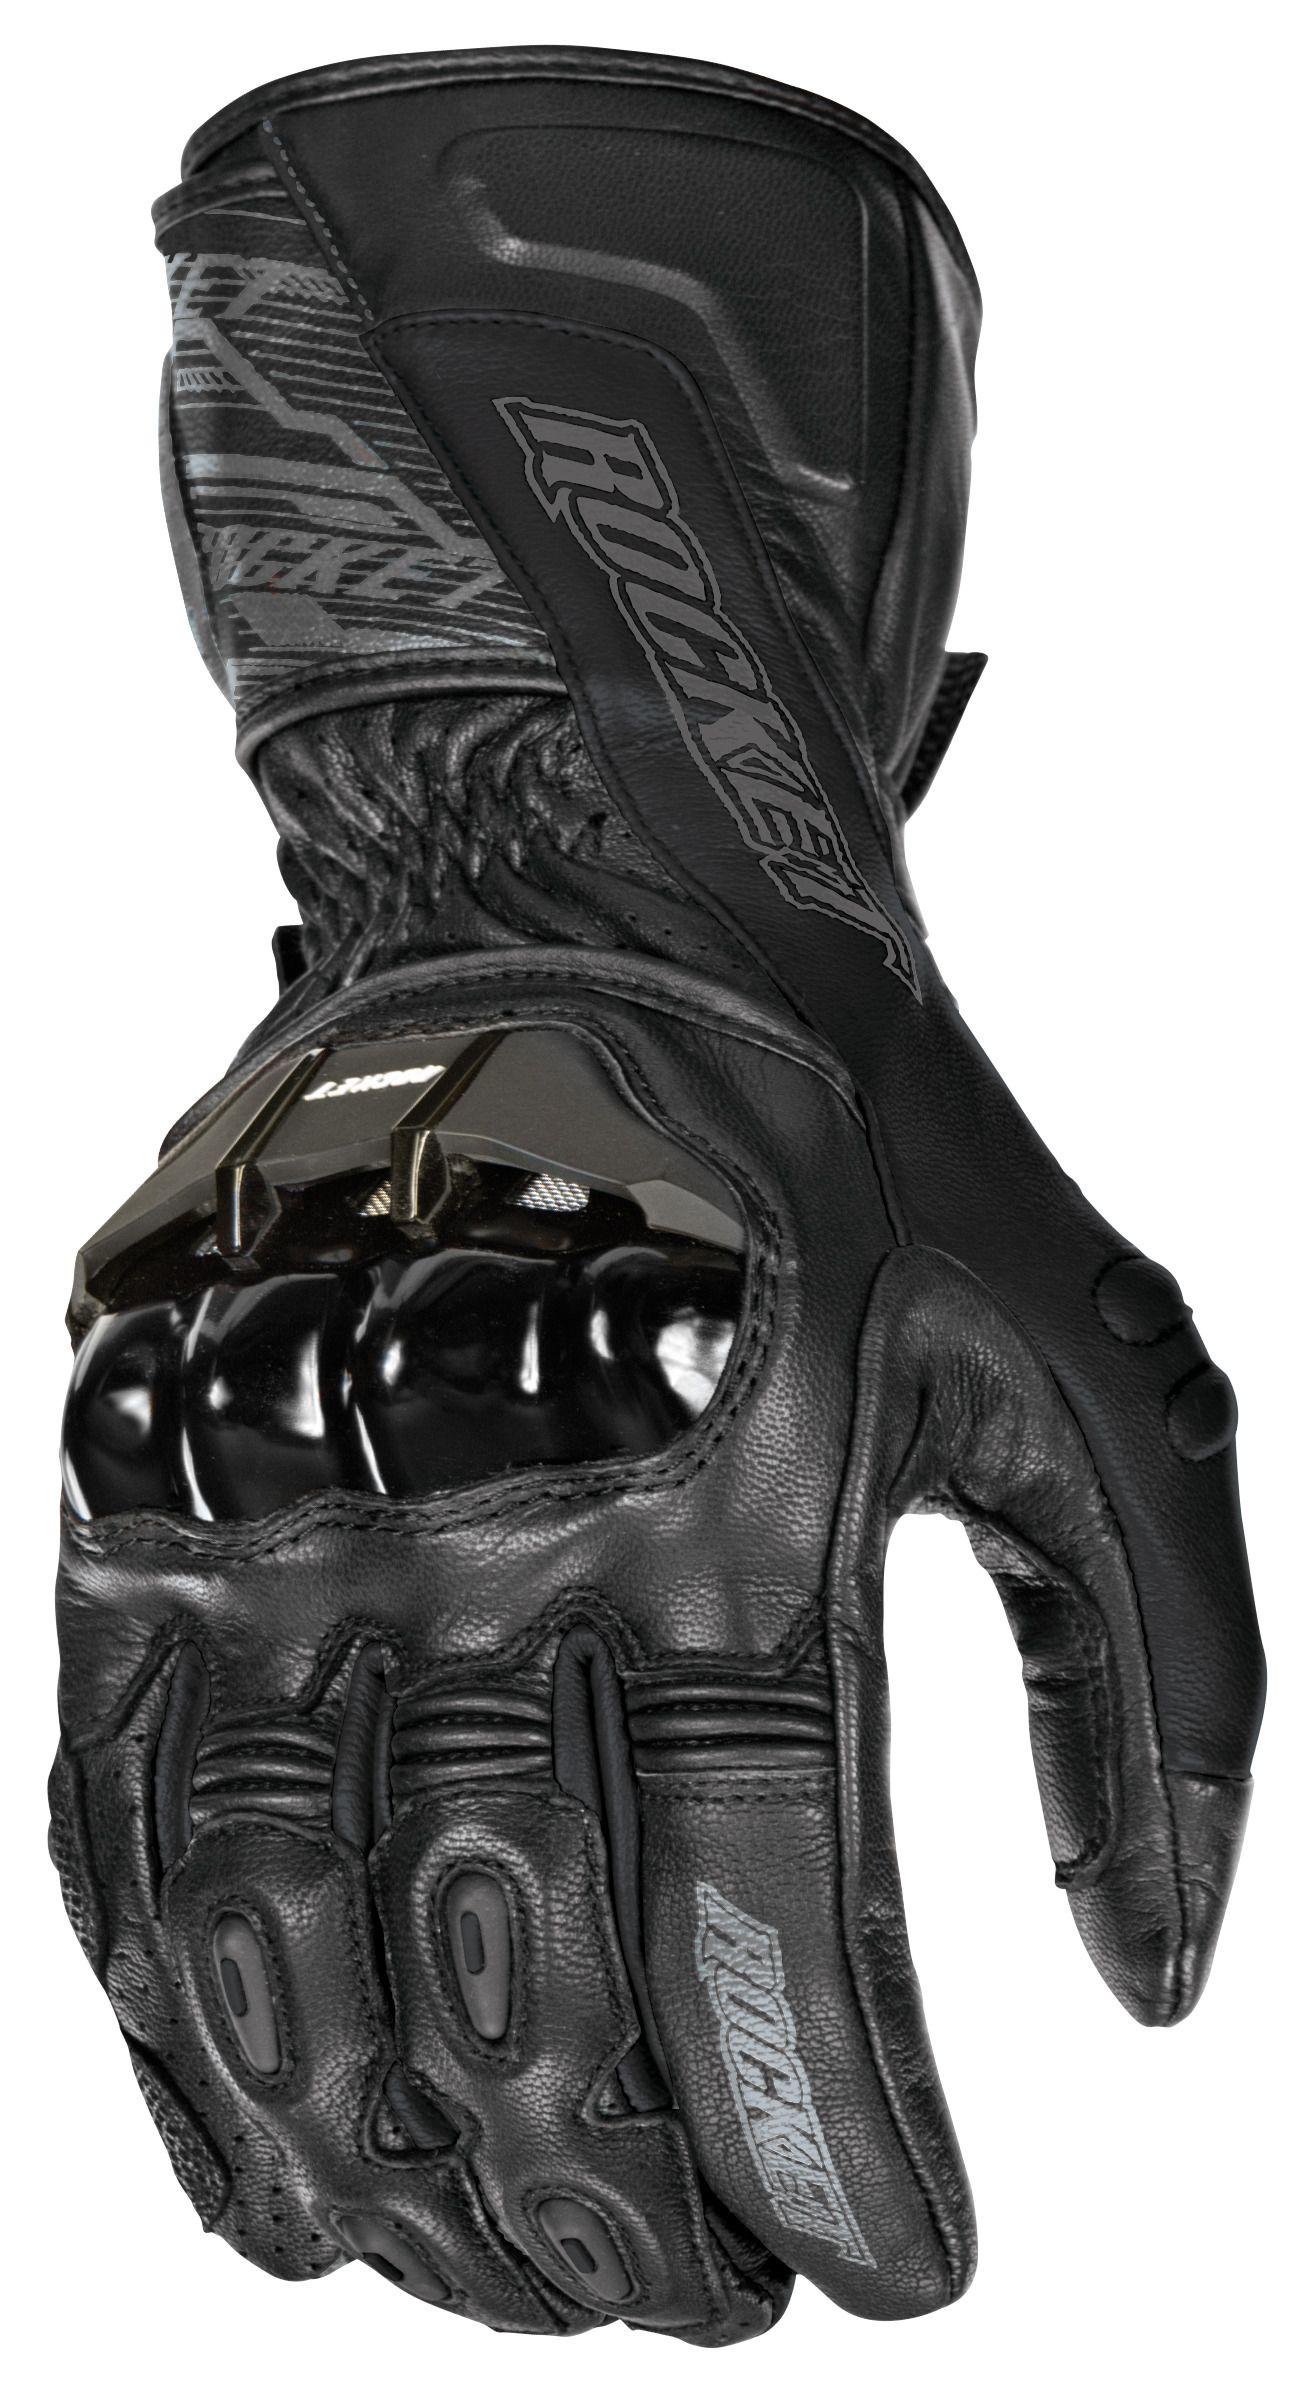 Joe rocket leather motorcycle gloves - Joe Rocket Leather Motorcycle Gloves 9